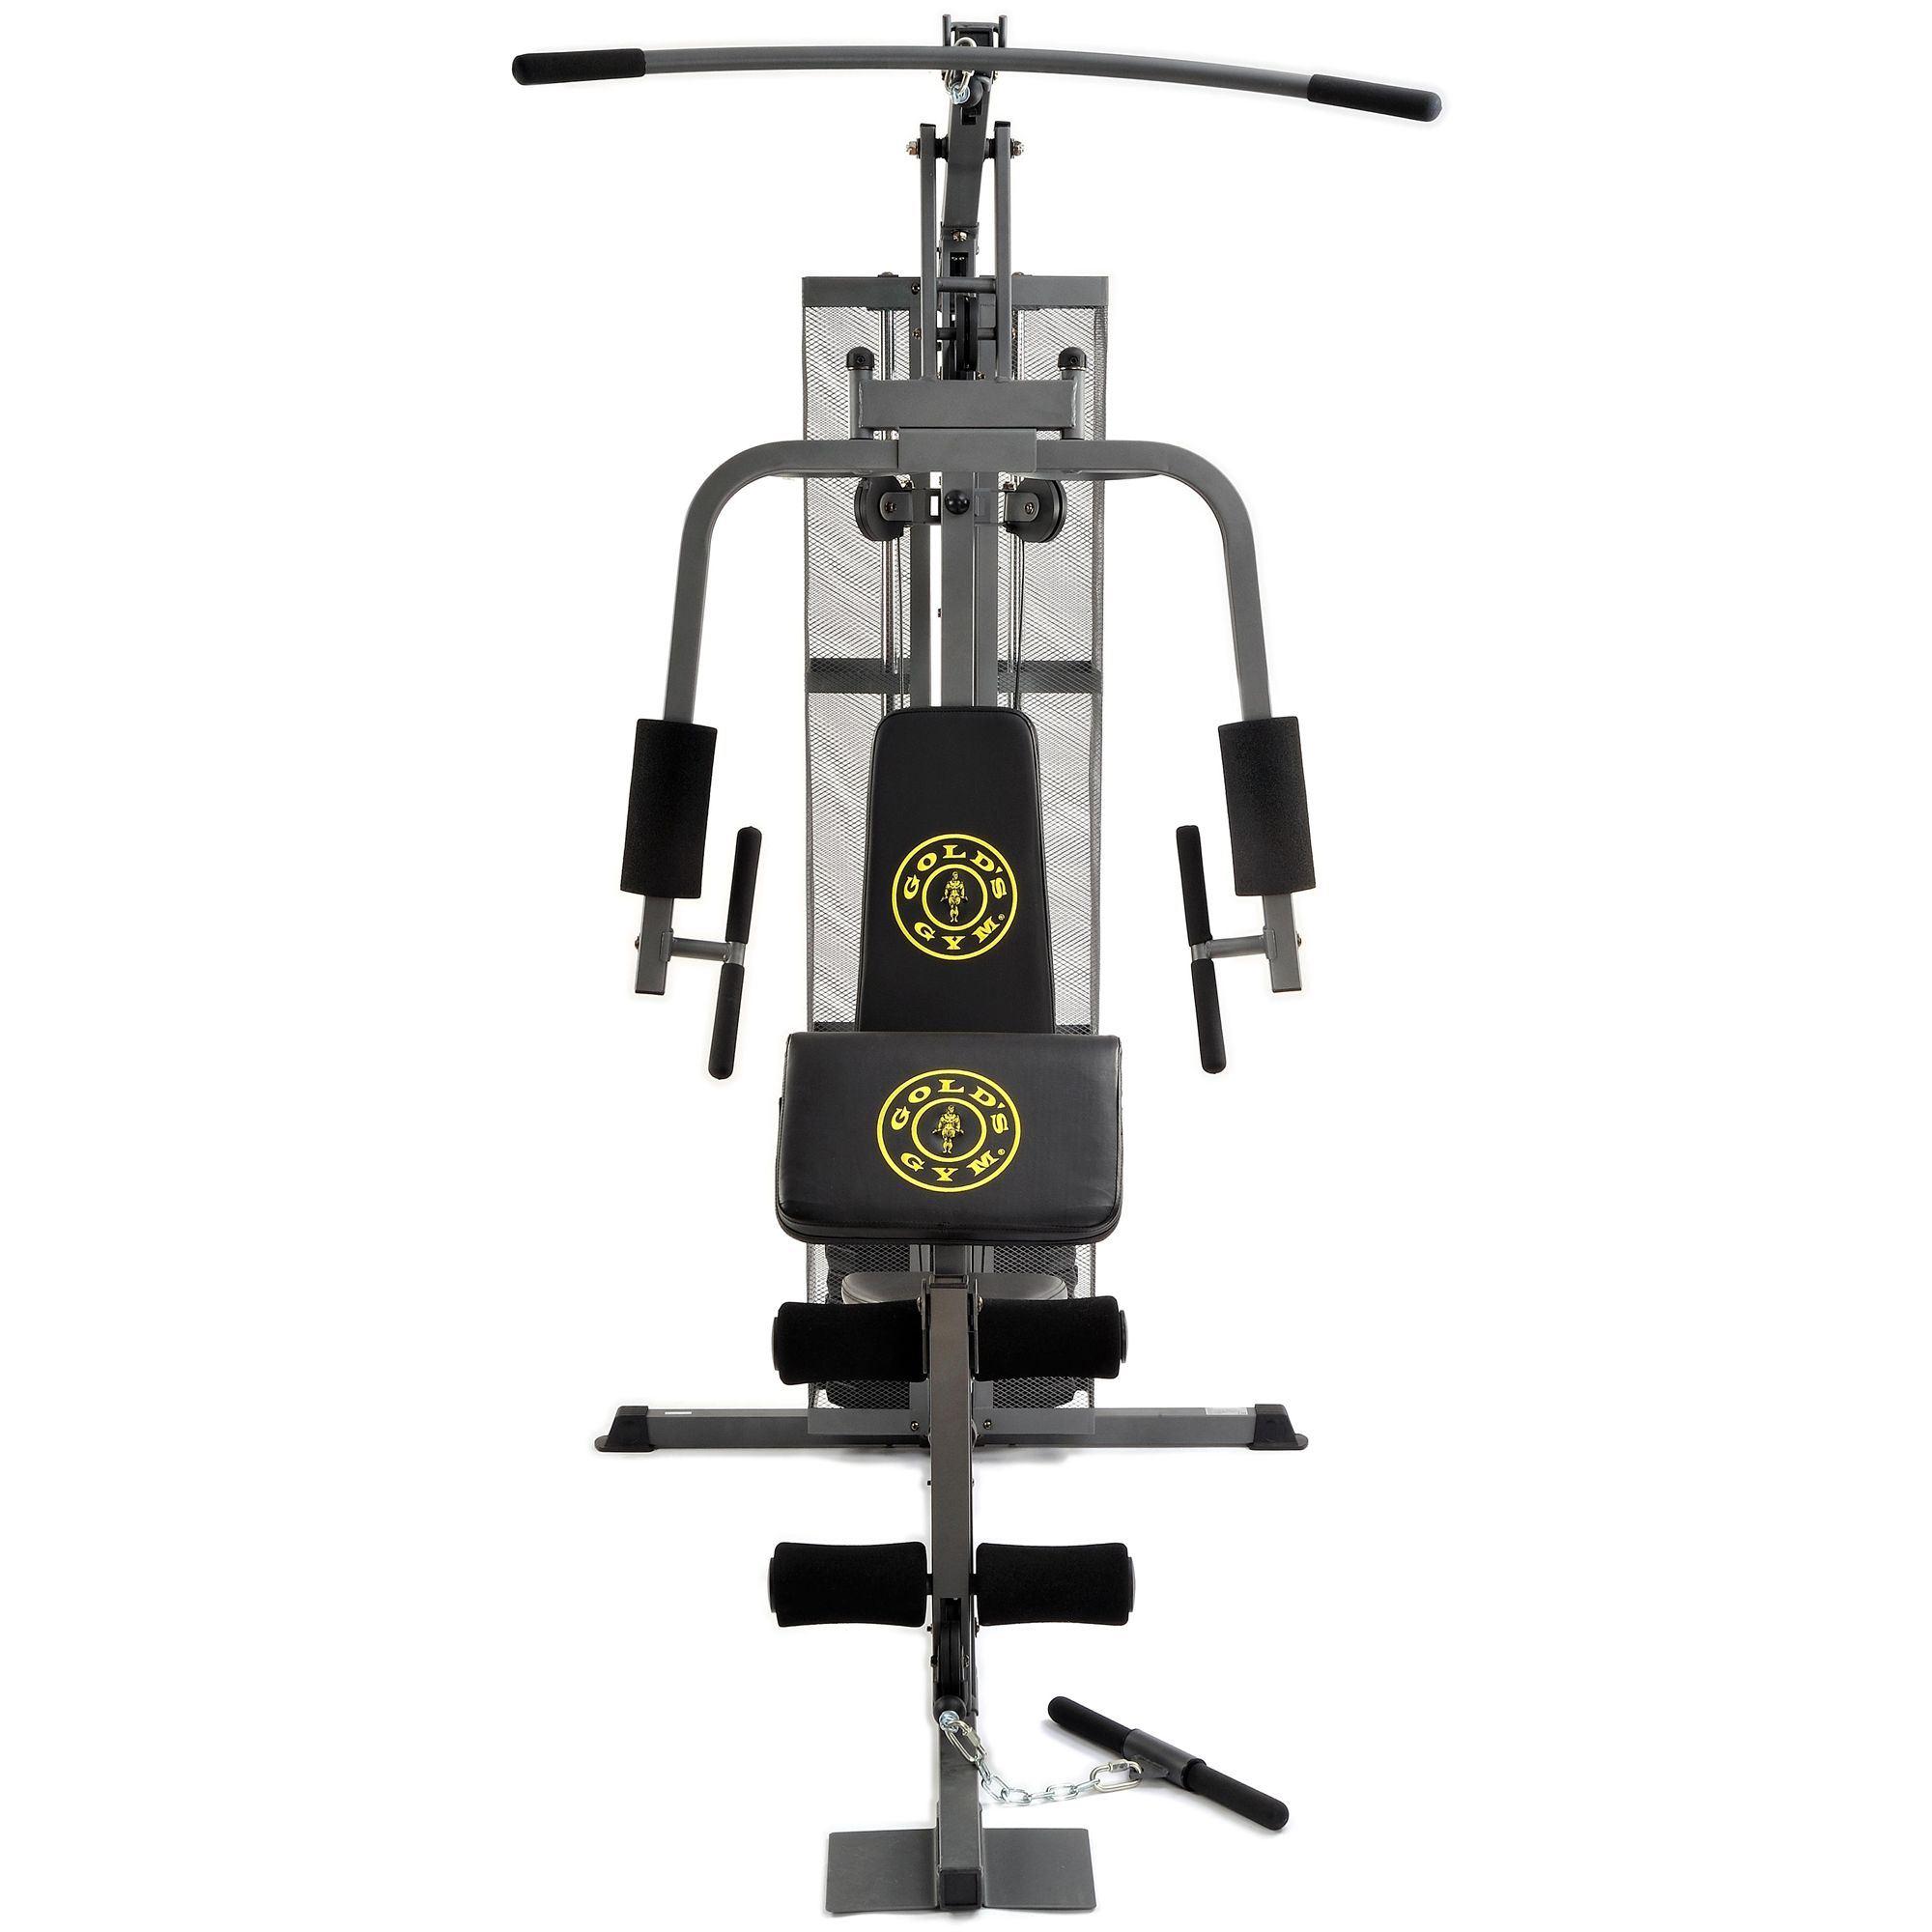 Golds gym multi sweatband